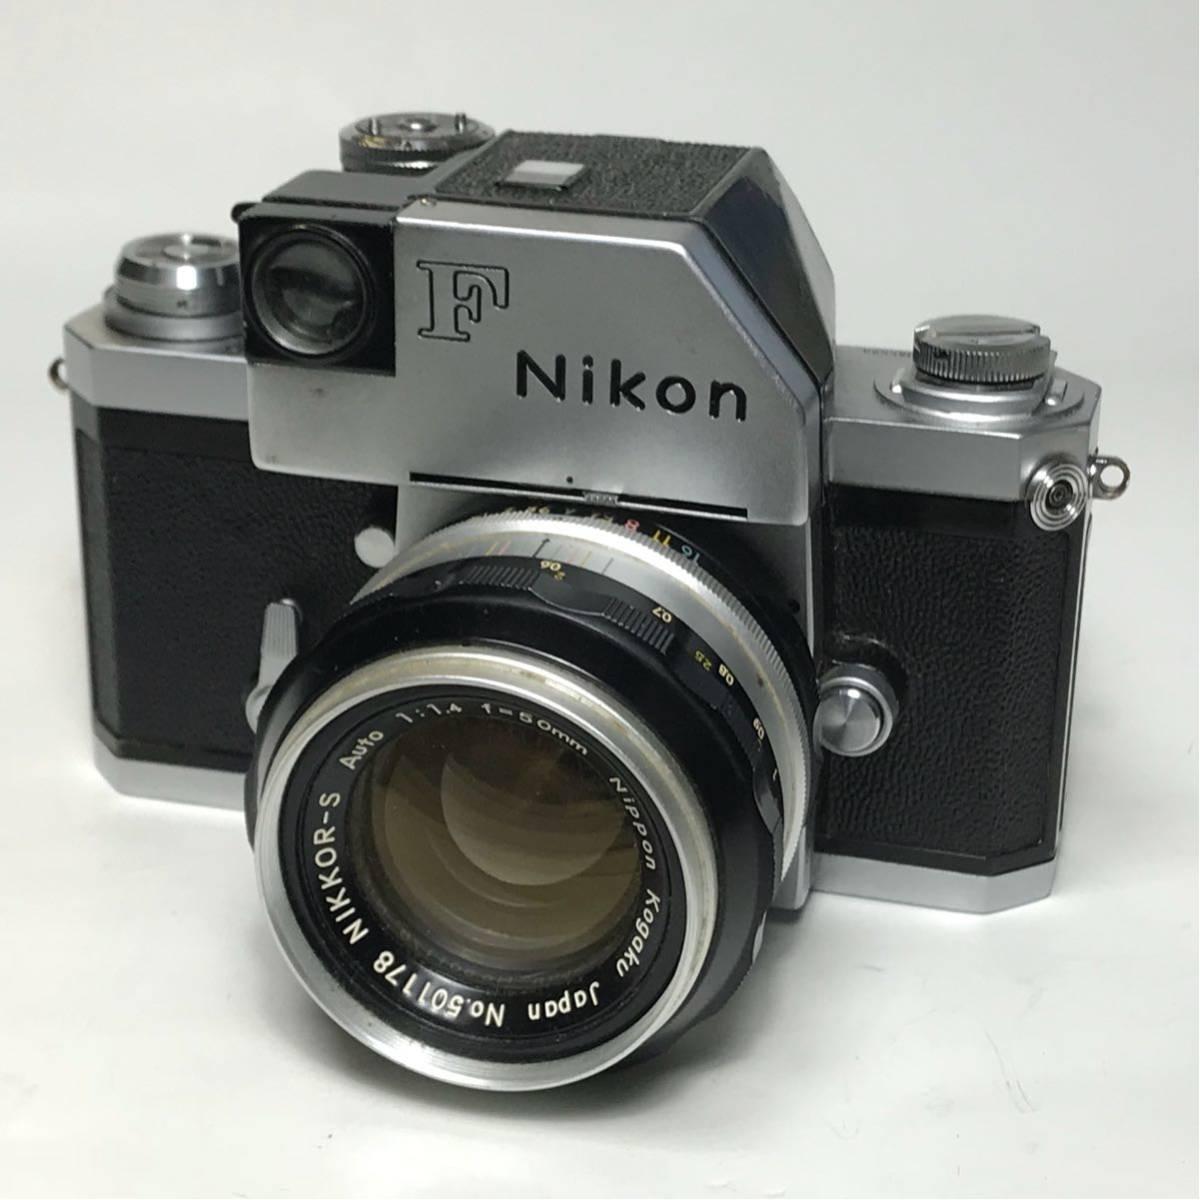 Nikon F Photomic FTN /ニコン F 外部測光式フォトミックファインダー SLR FILM CAMERA with/Nikkor 1.4 50㎜【c/n7065523】